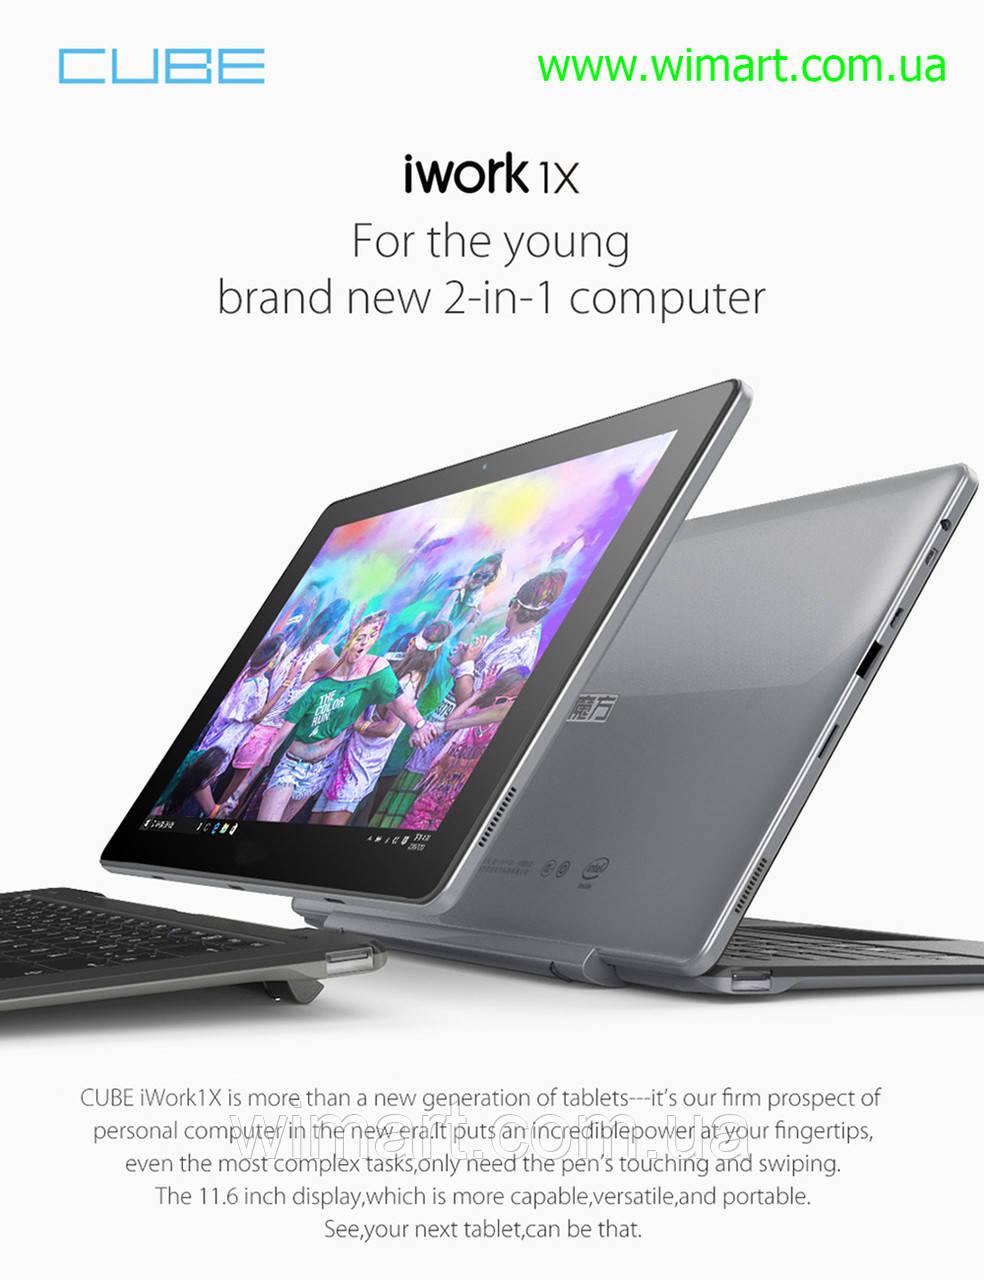 Планшет Cube iWork1X (U116GT1) Intel Atom X5- Z8350 4GB/64GB Windows 10.